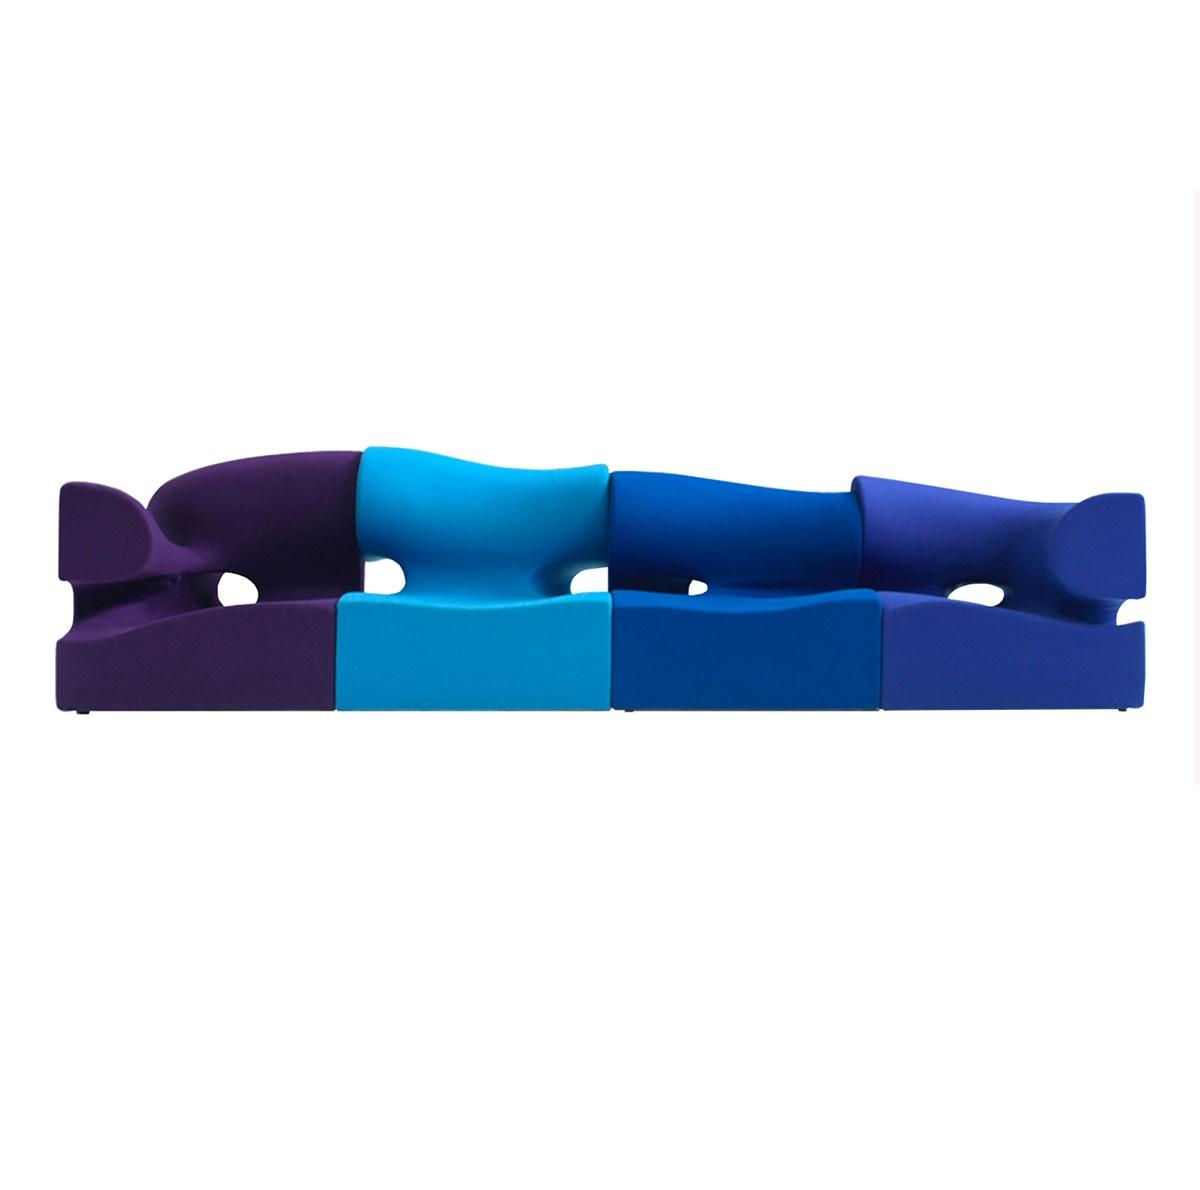 Moroso-Ron-Arad-Misfits-Sofa-System-Matisse-1